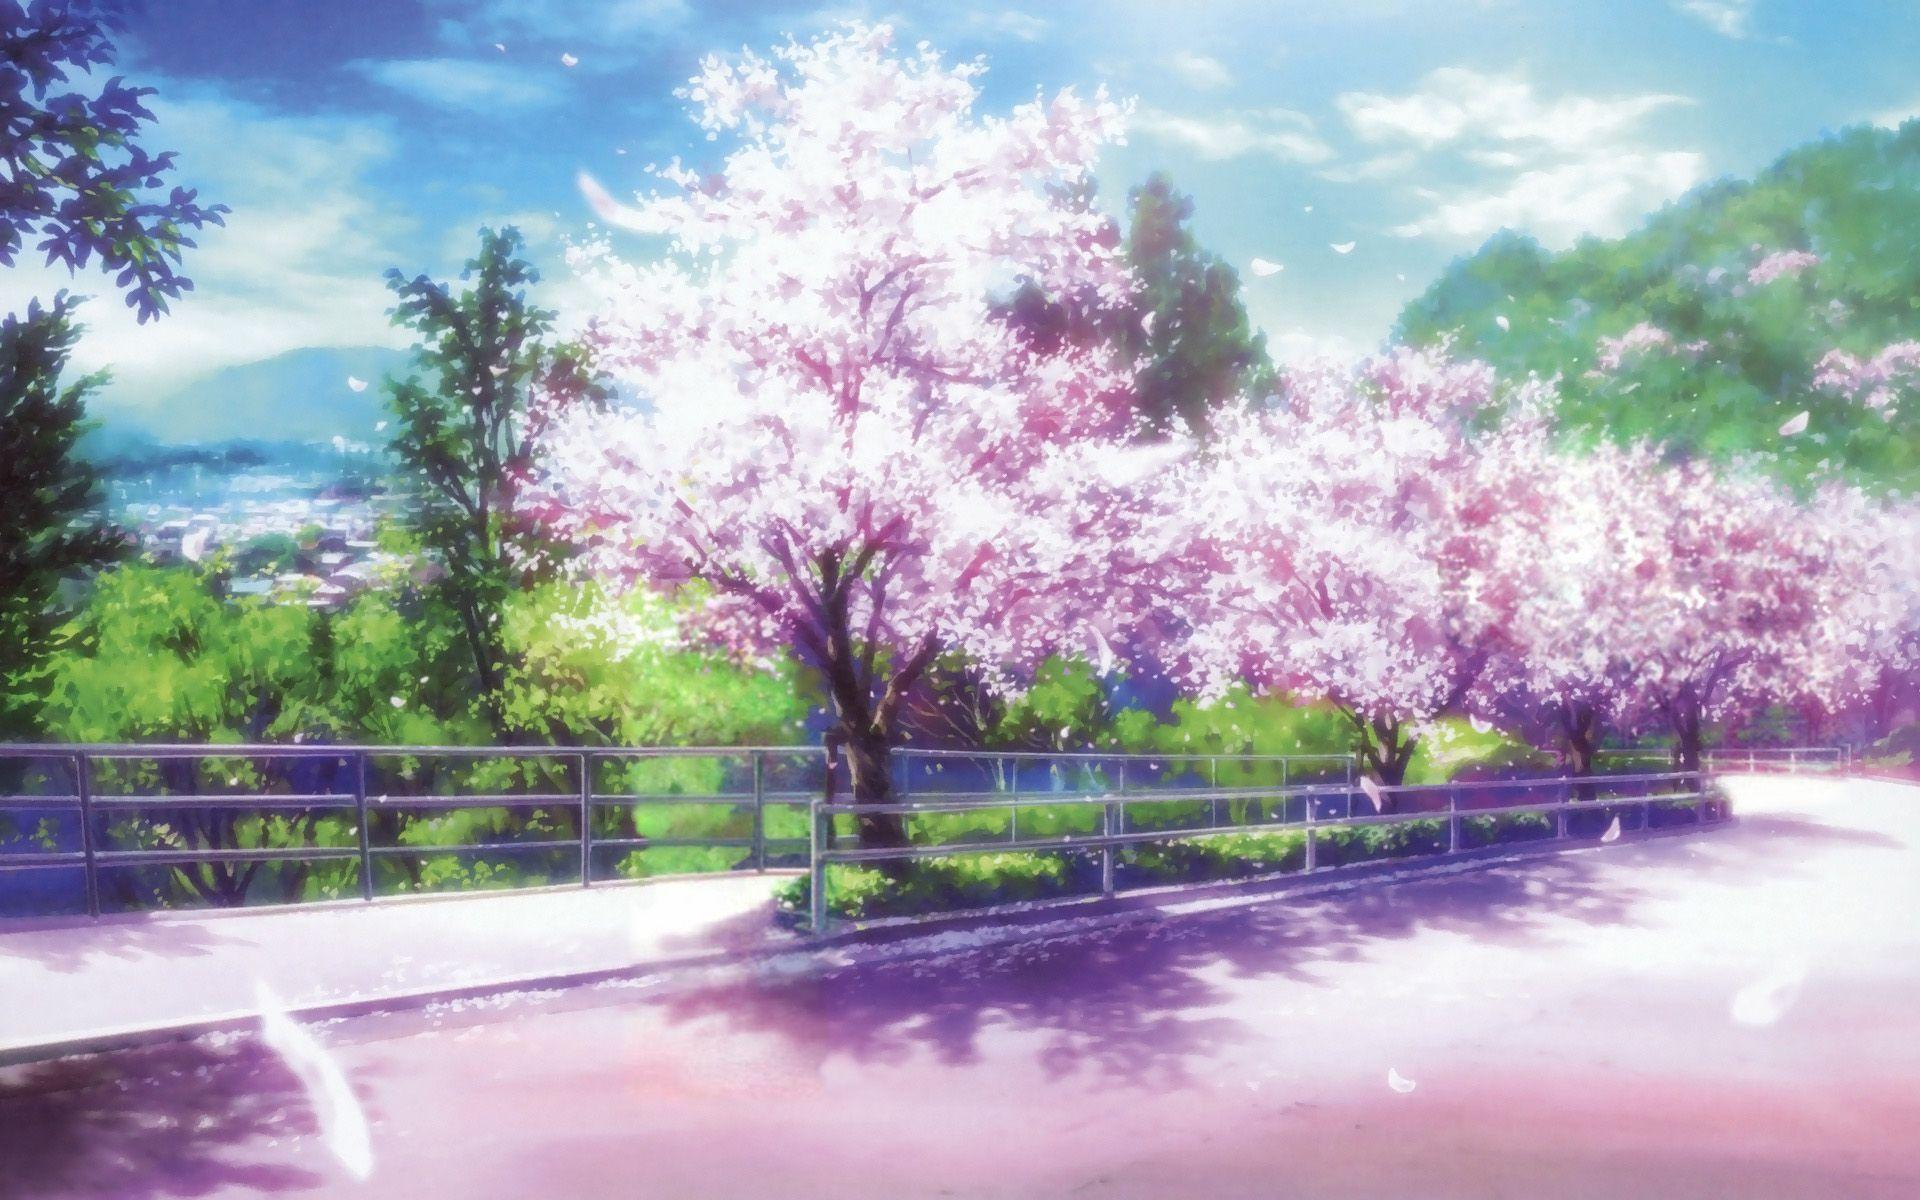 Anime Sakura Trees HD Wallpapers - Wallpaper Cave